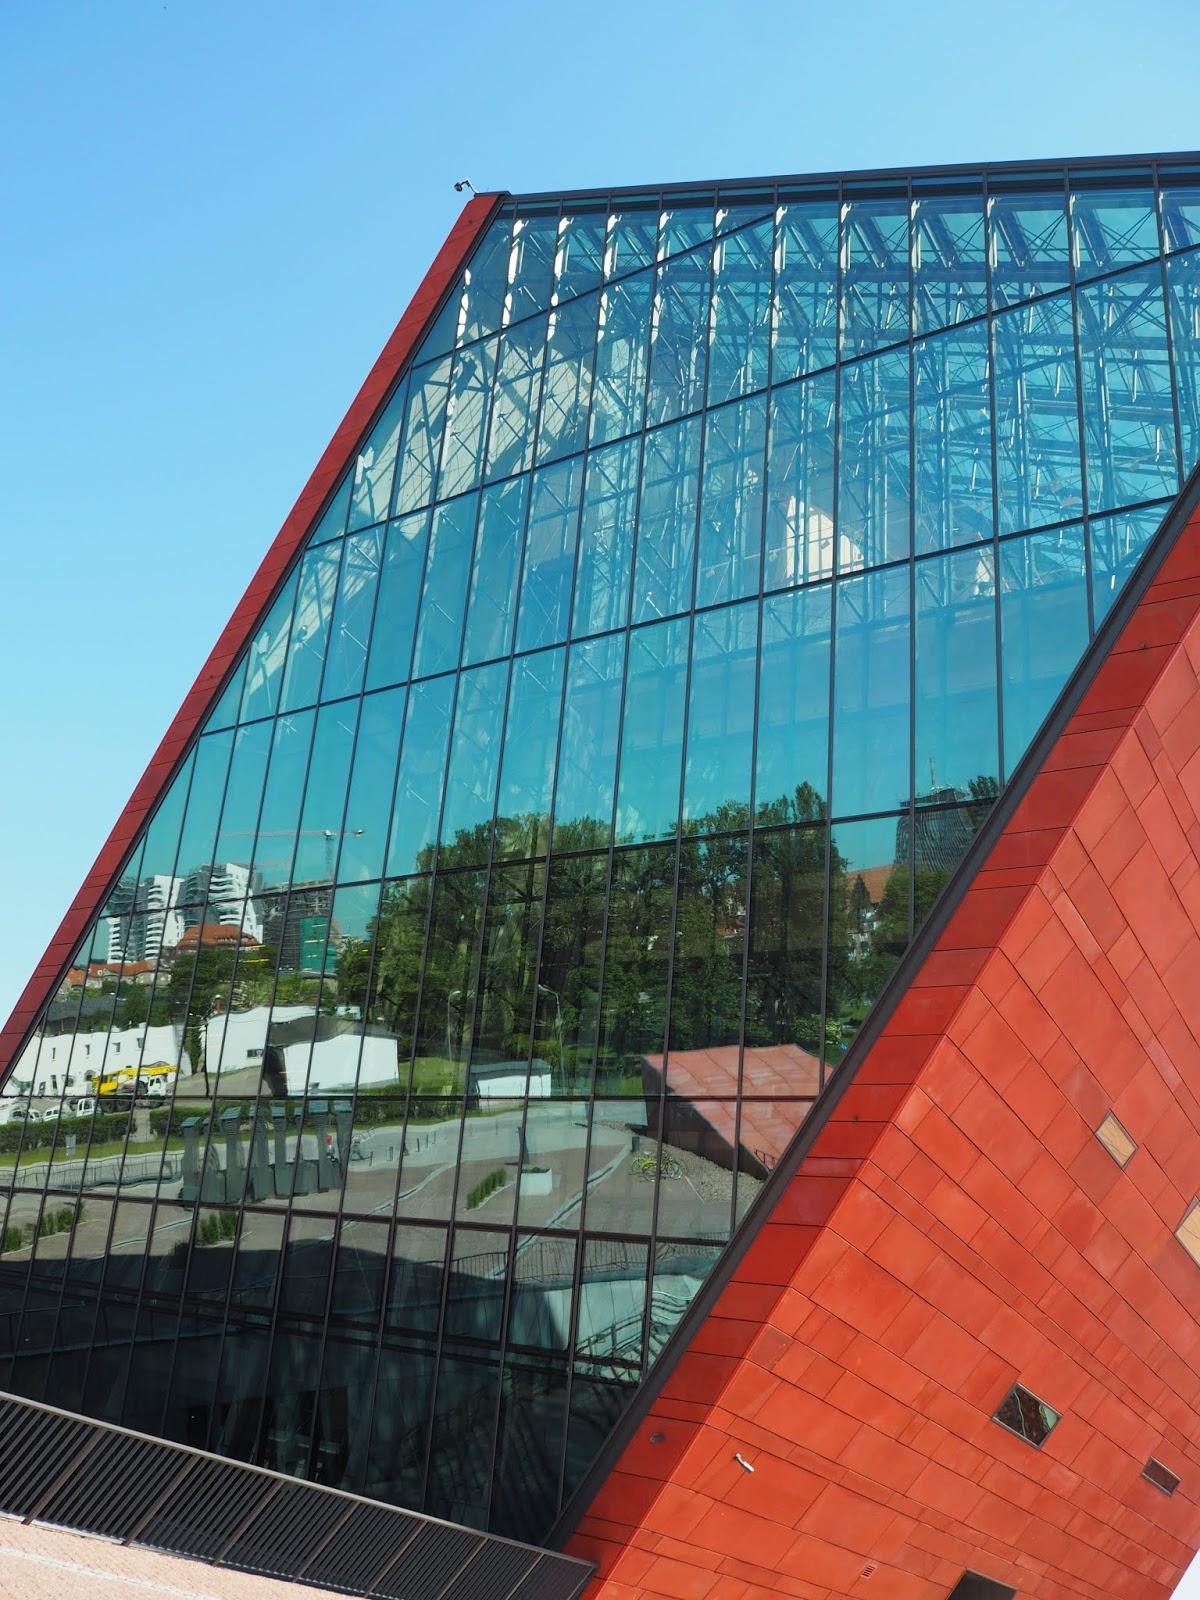 sotamuseo gdansk